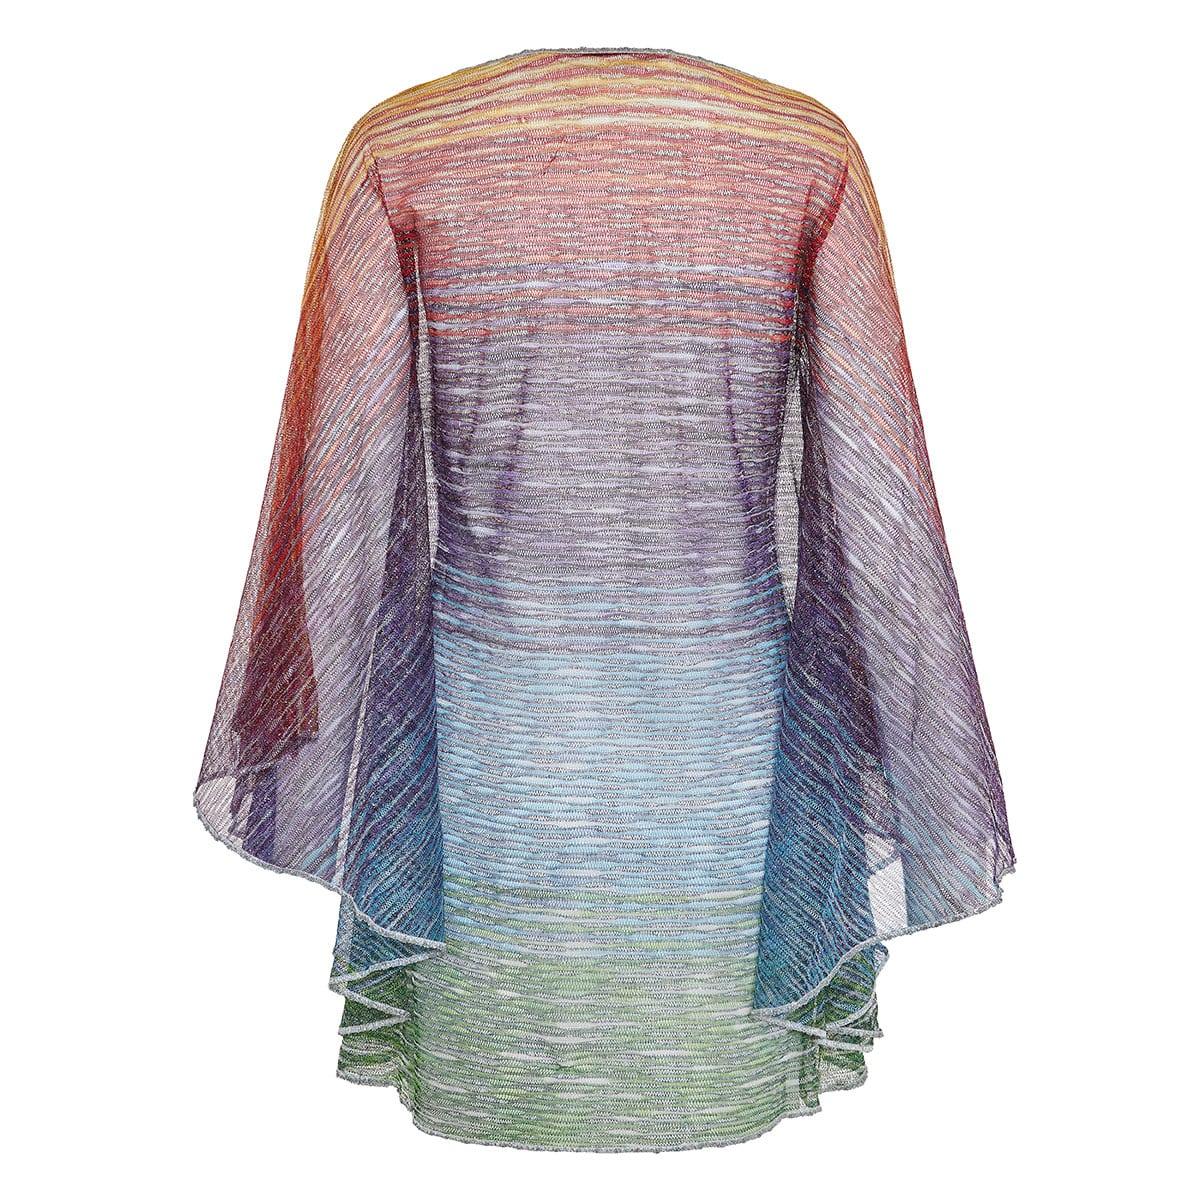 Bell-sleeved knitted beach dress